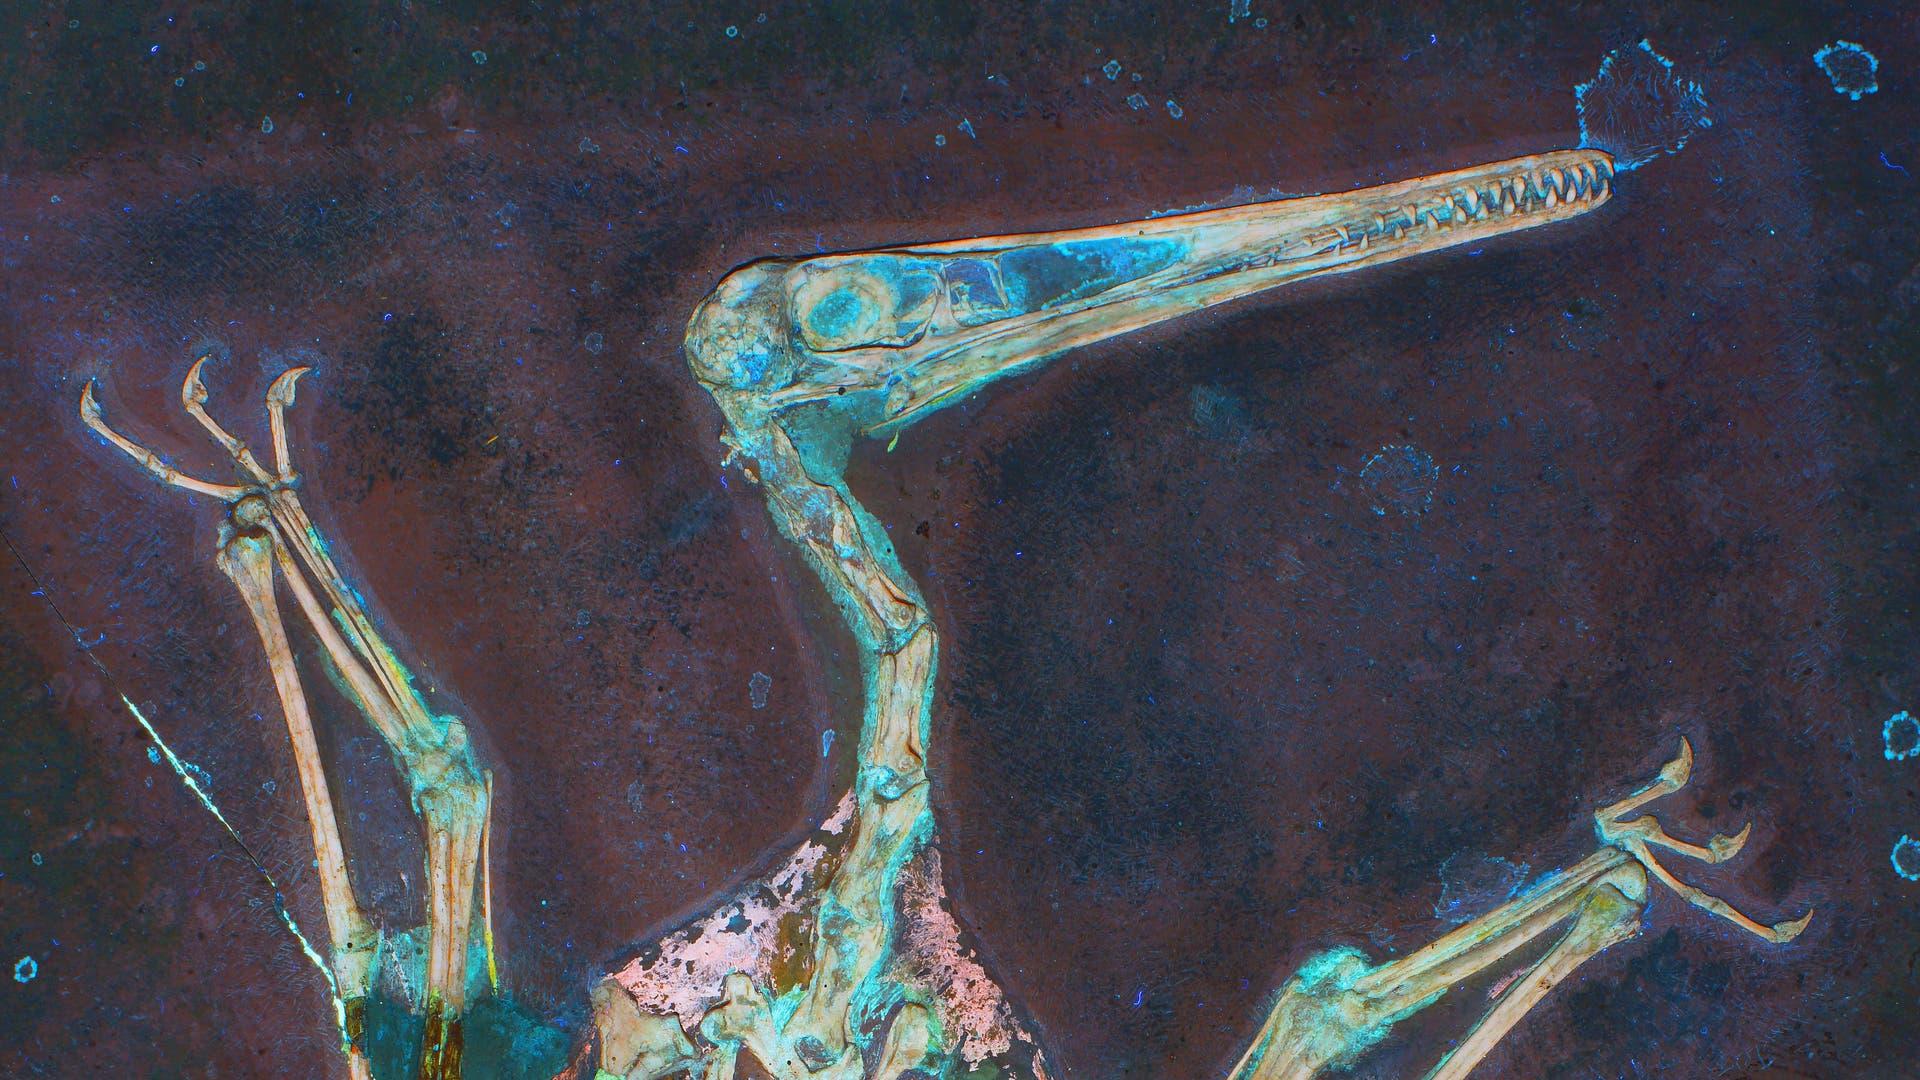 Pterodactylus aus dem Solnhofer Plattenkalk